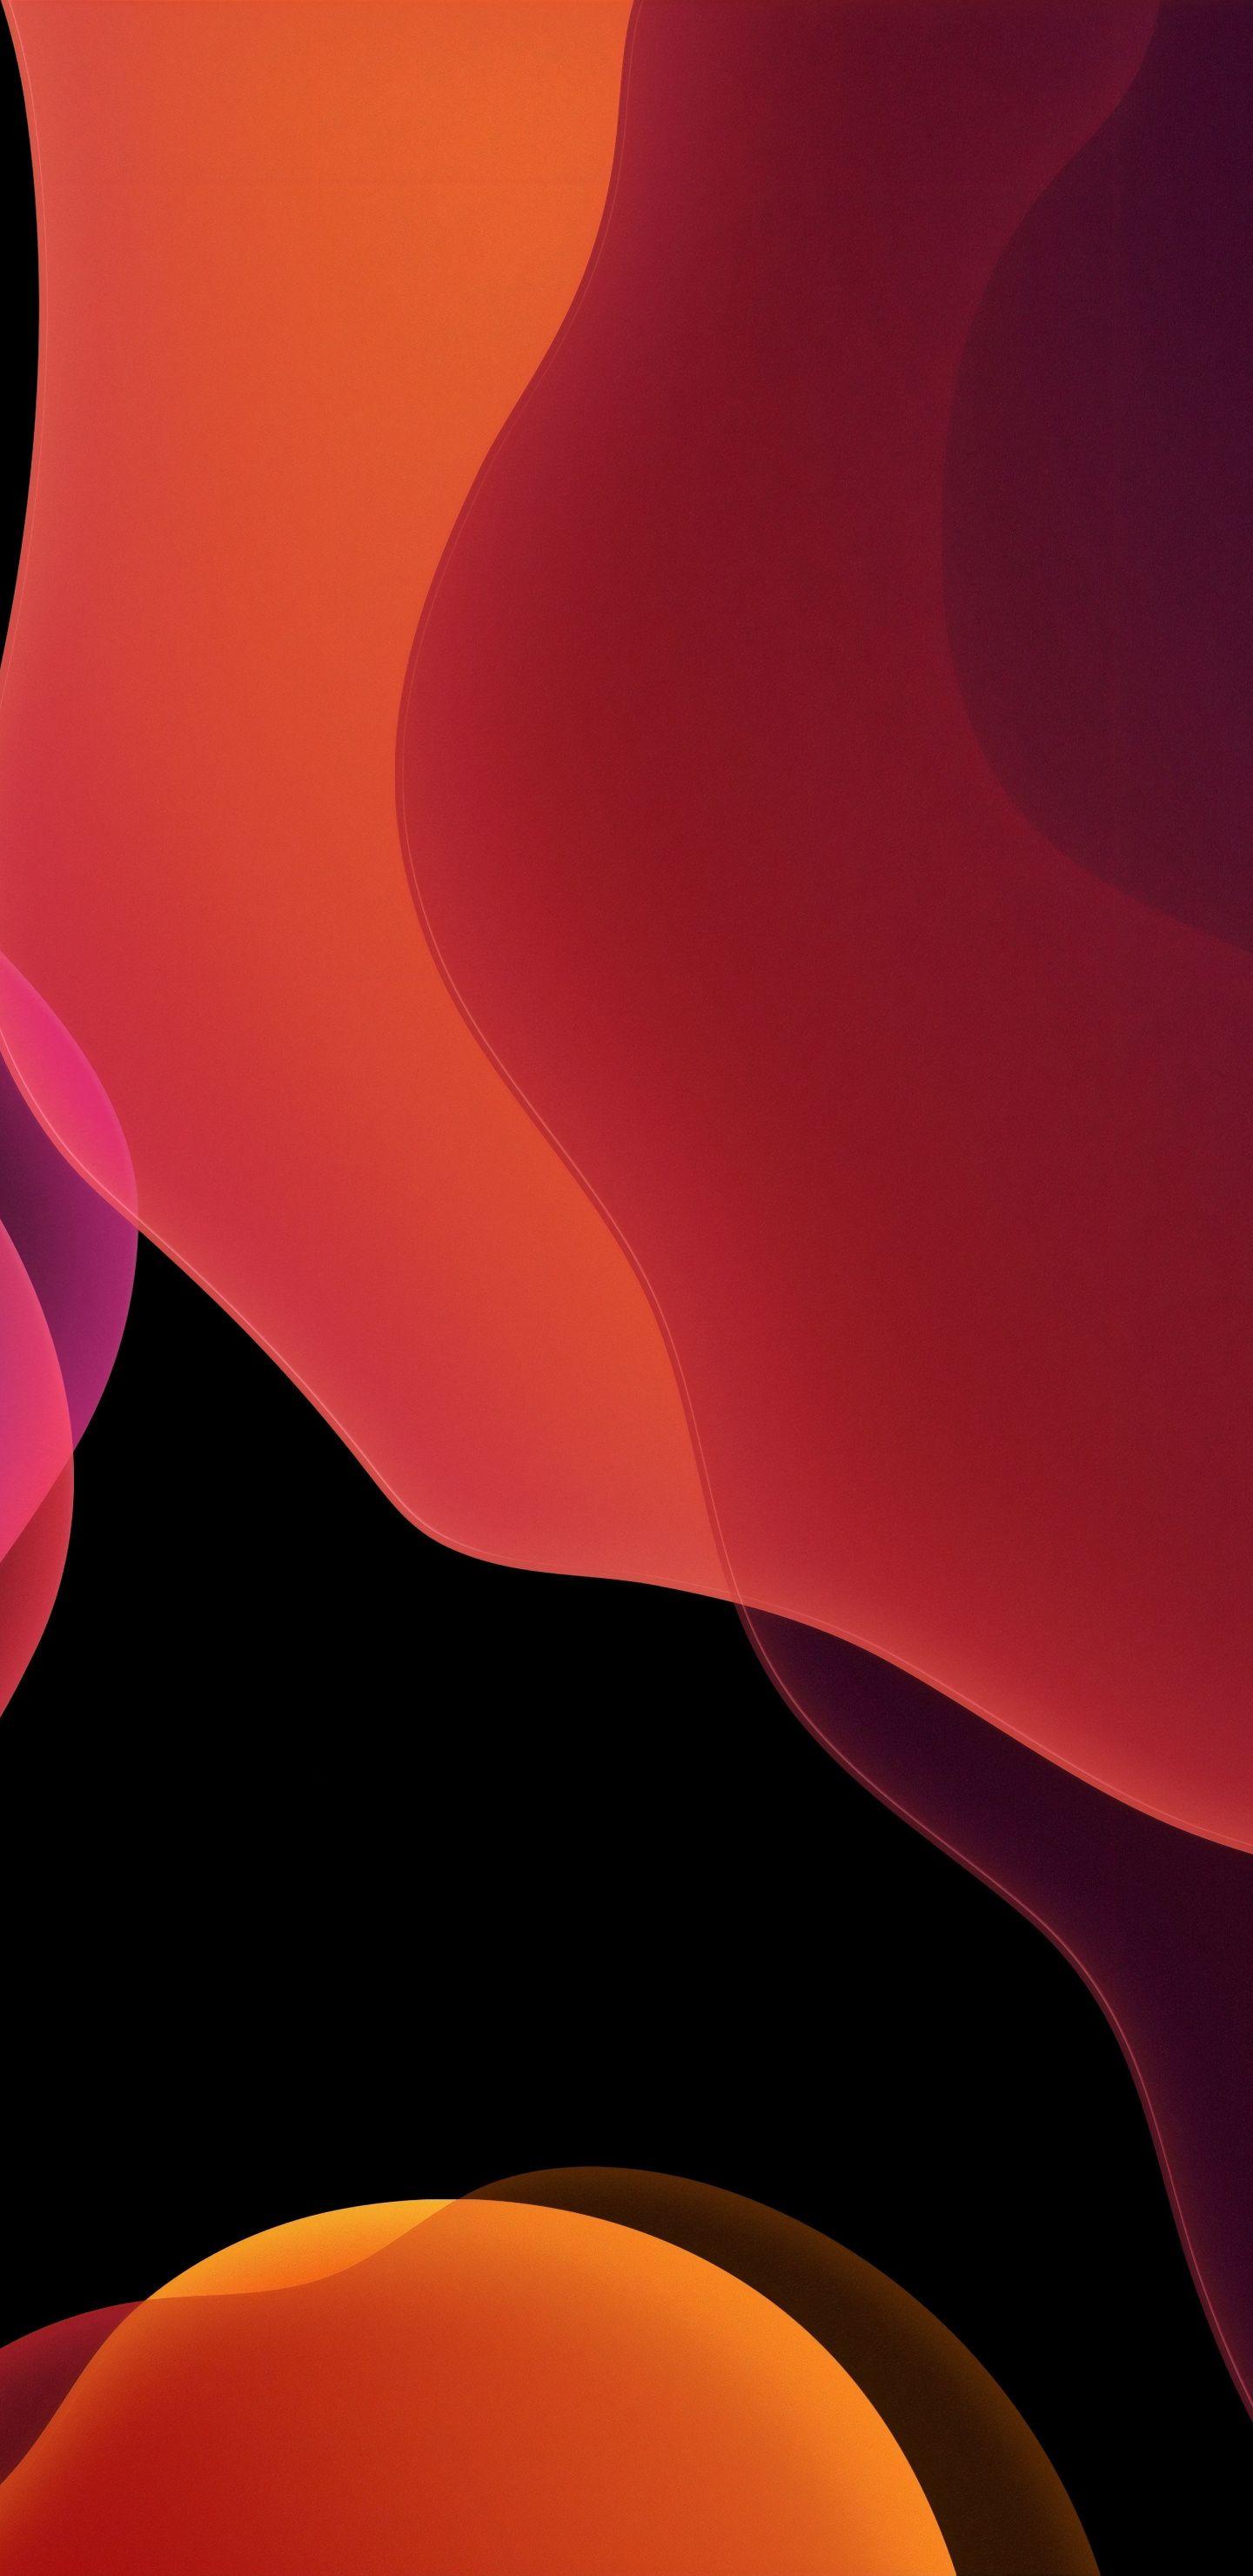 1440x2960 Stock Ios 13 Dark Orange Abstract Wallpaper Iphone Wallpaper Ios Abstract Wallpaper Iphone Wallpaper